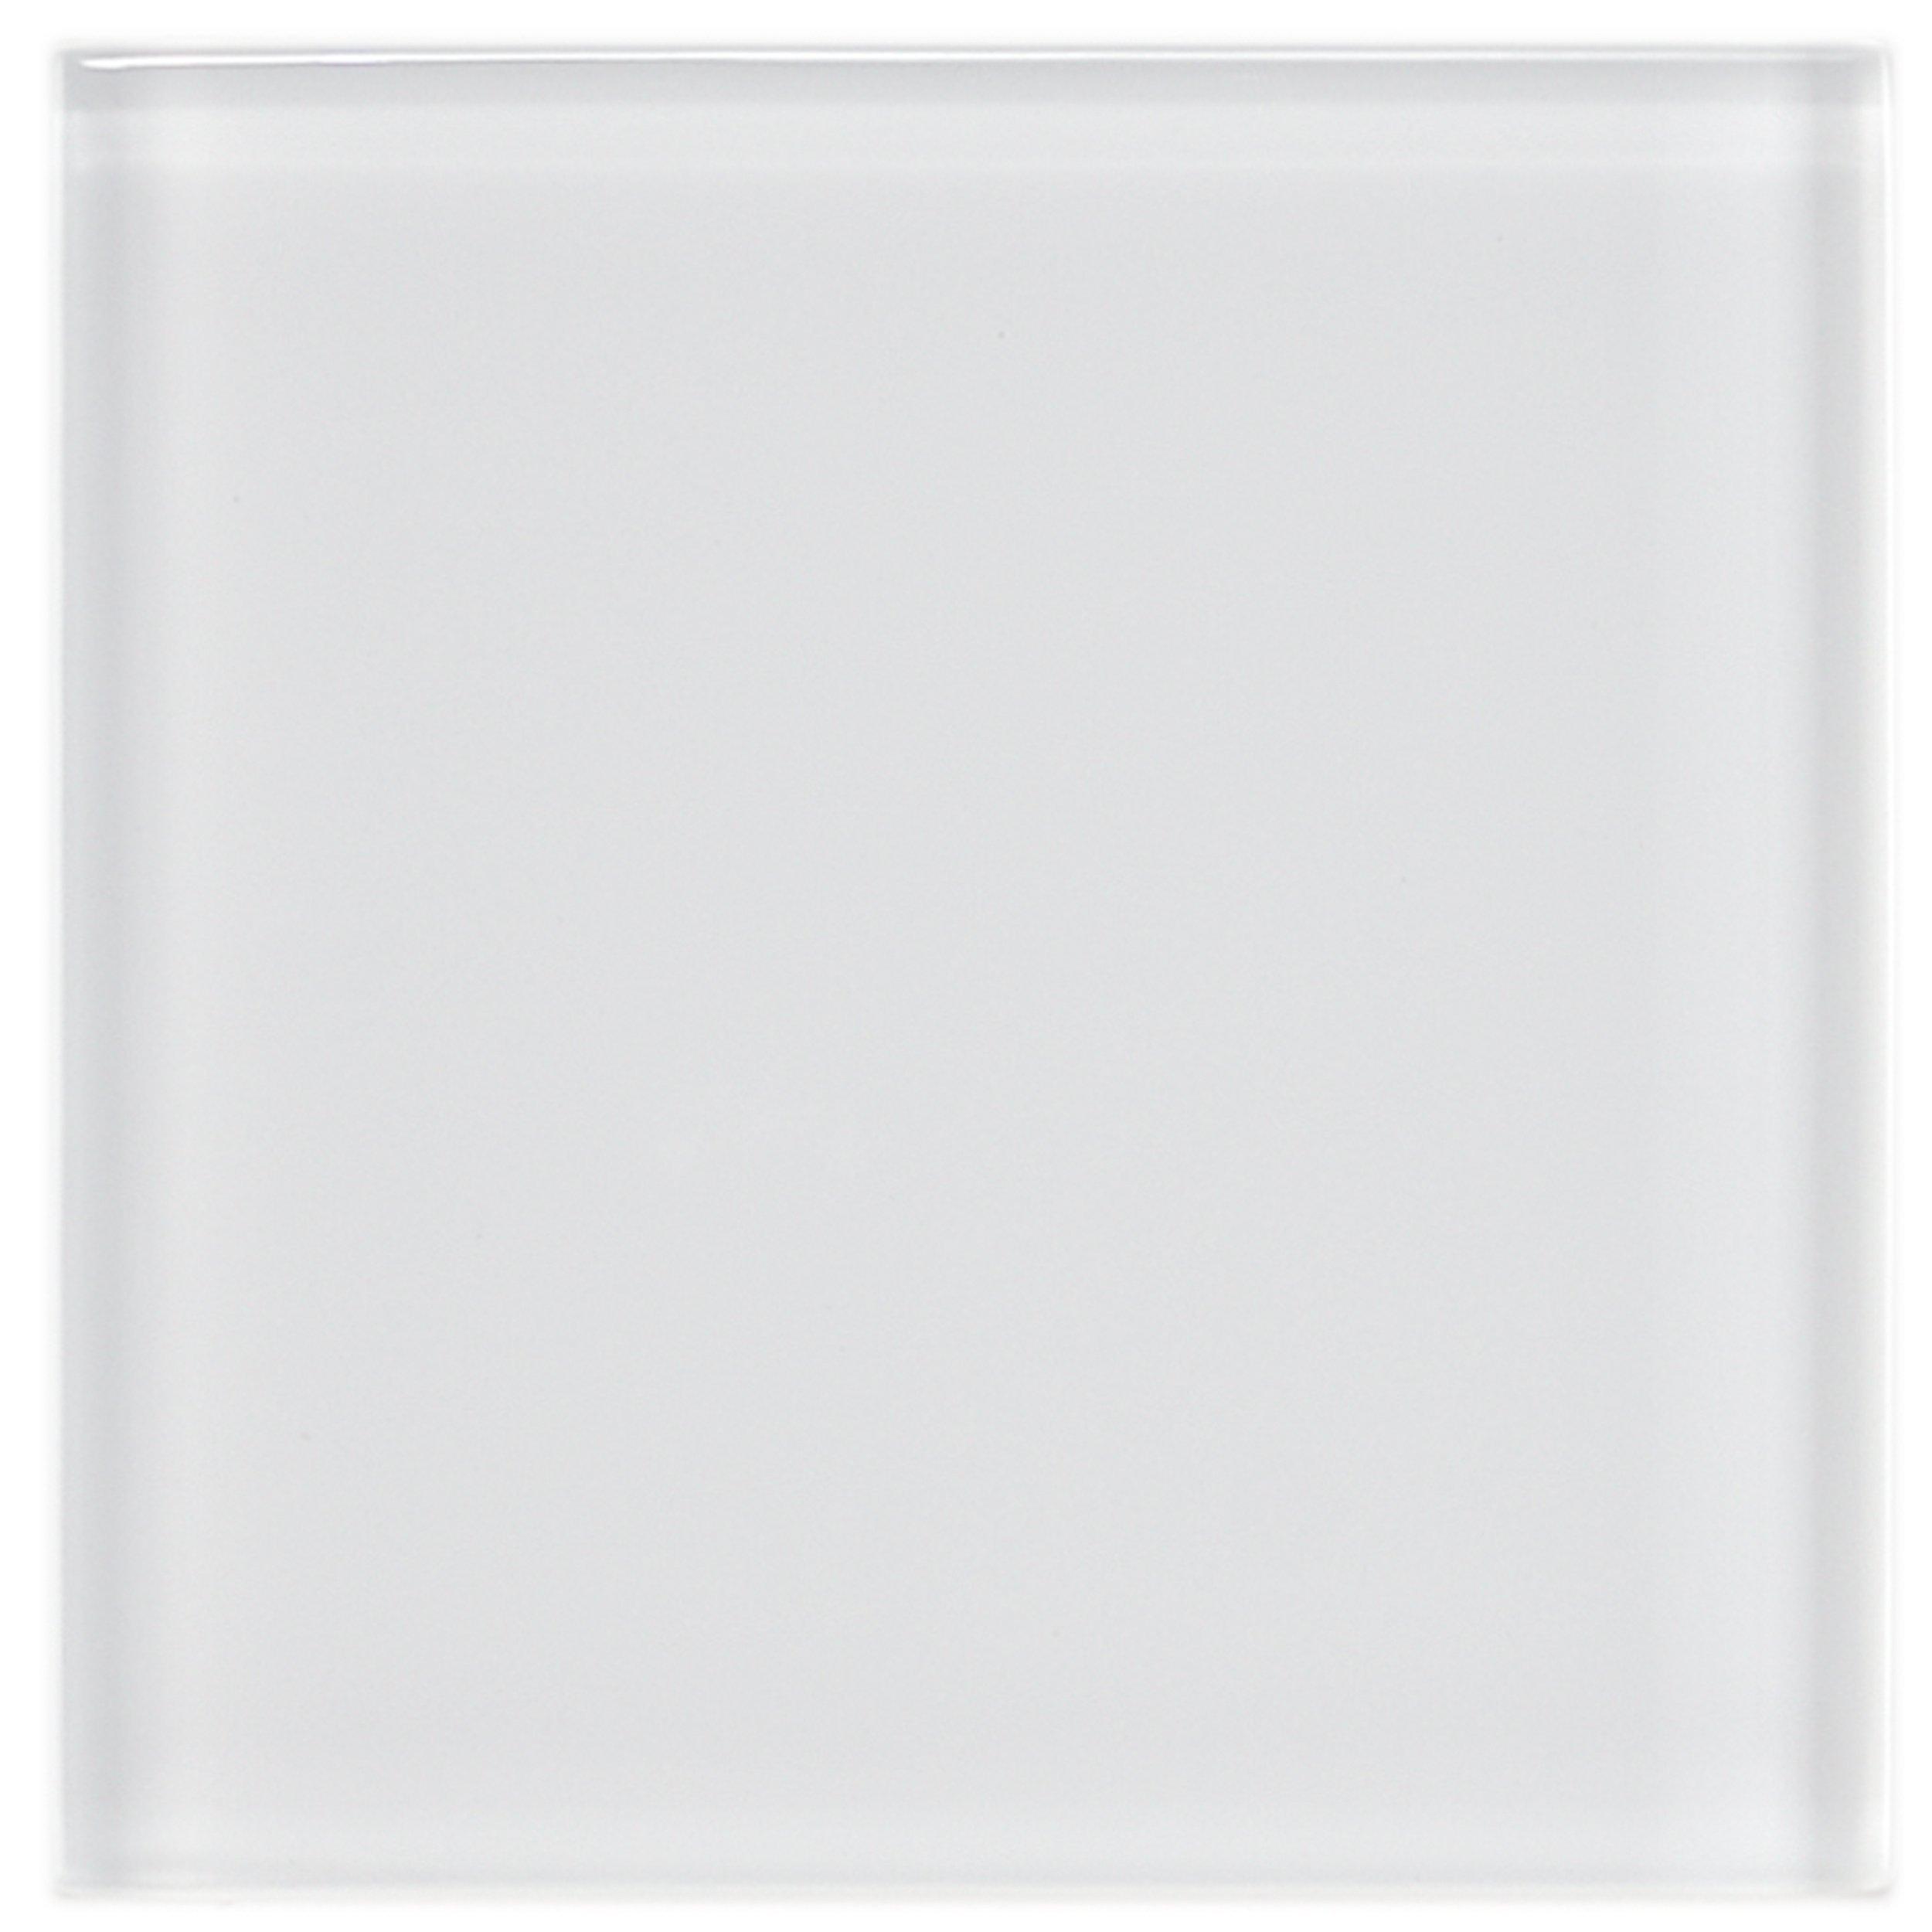 SomerTile GDM4IC Sierra Glass Wall Tile, 4'' x 4'', Ice White